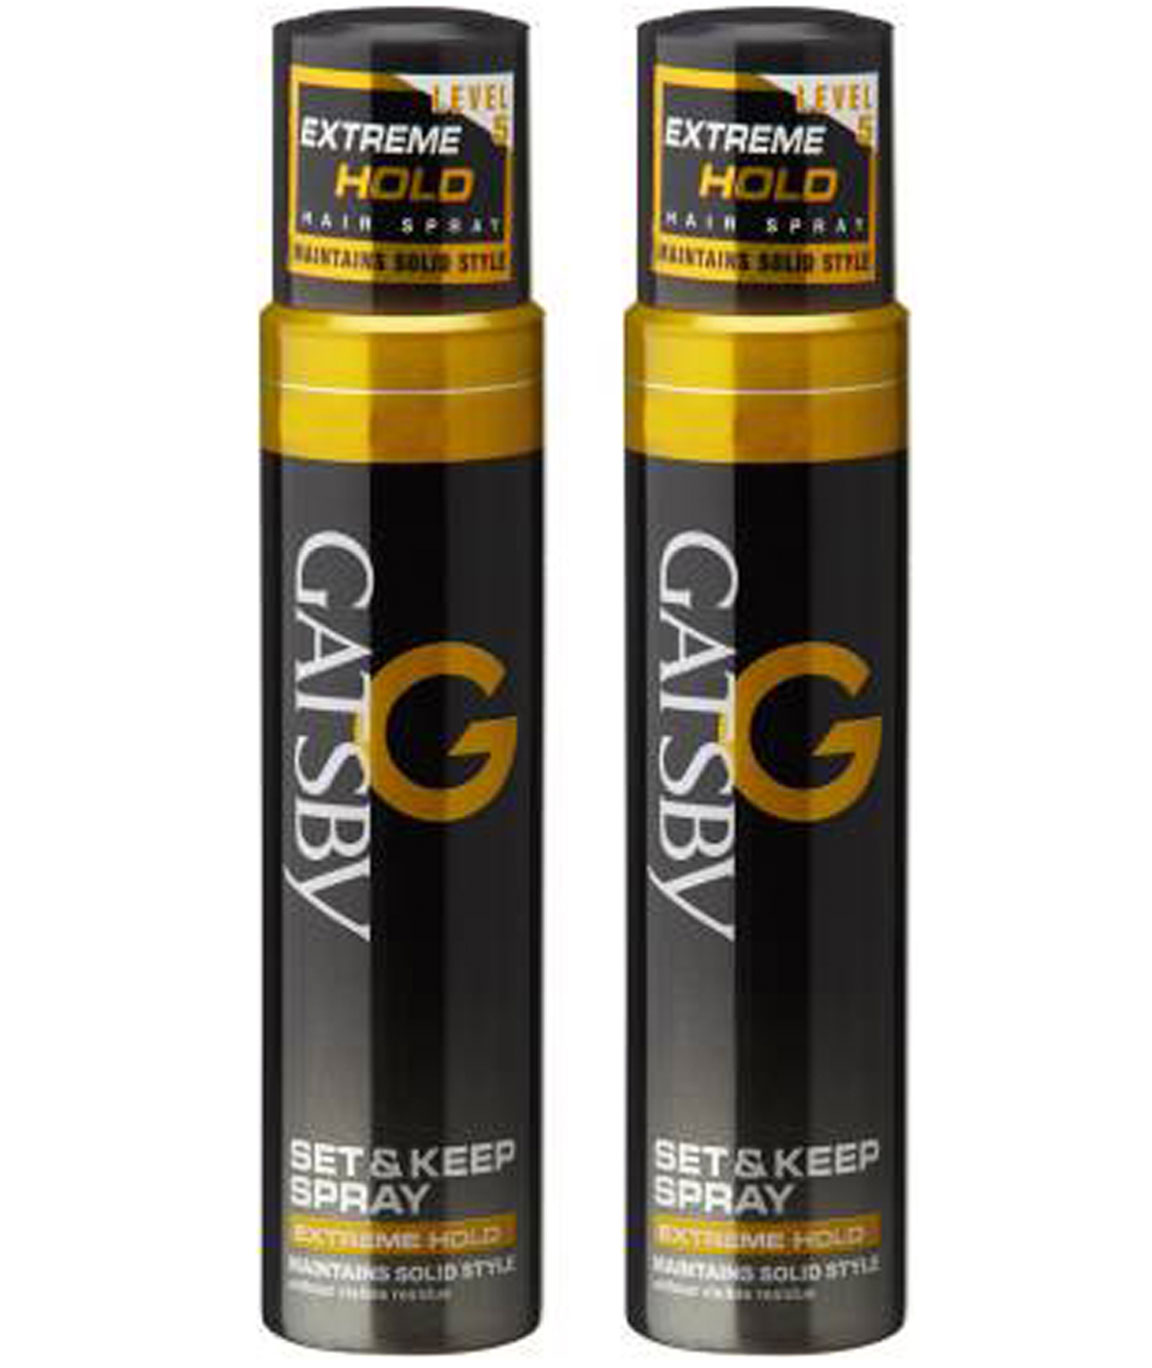 GATSBY SET & KEEP HAIR SPRAY EXTREME HOLD (PACK OF 2) SPRAY (250 ML)